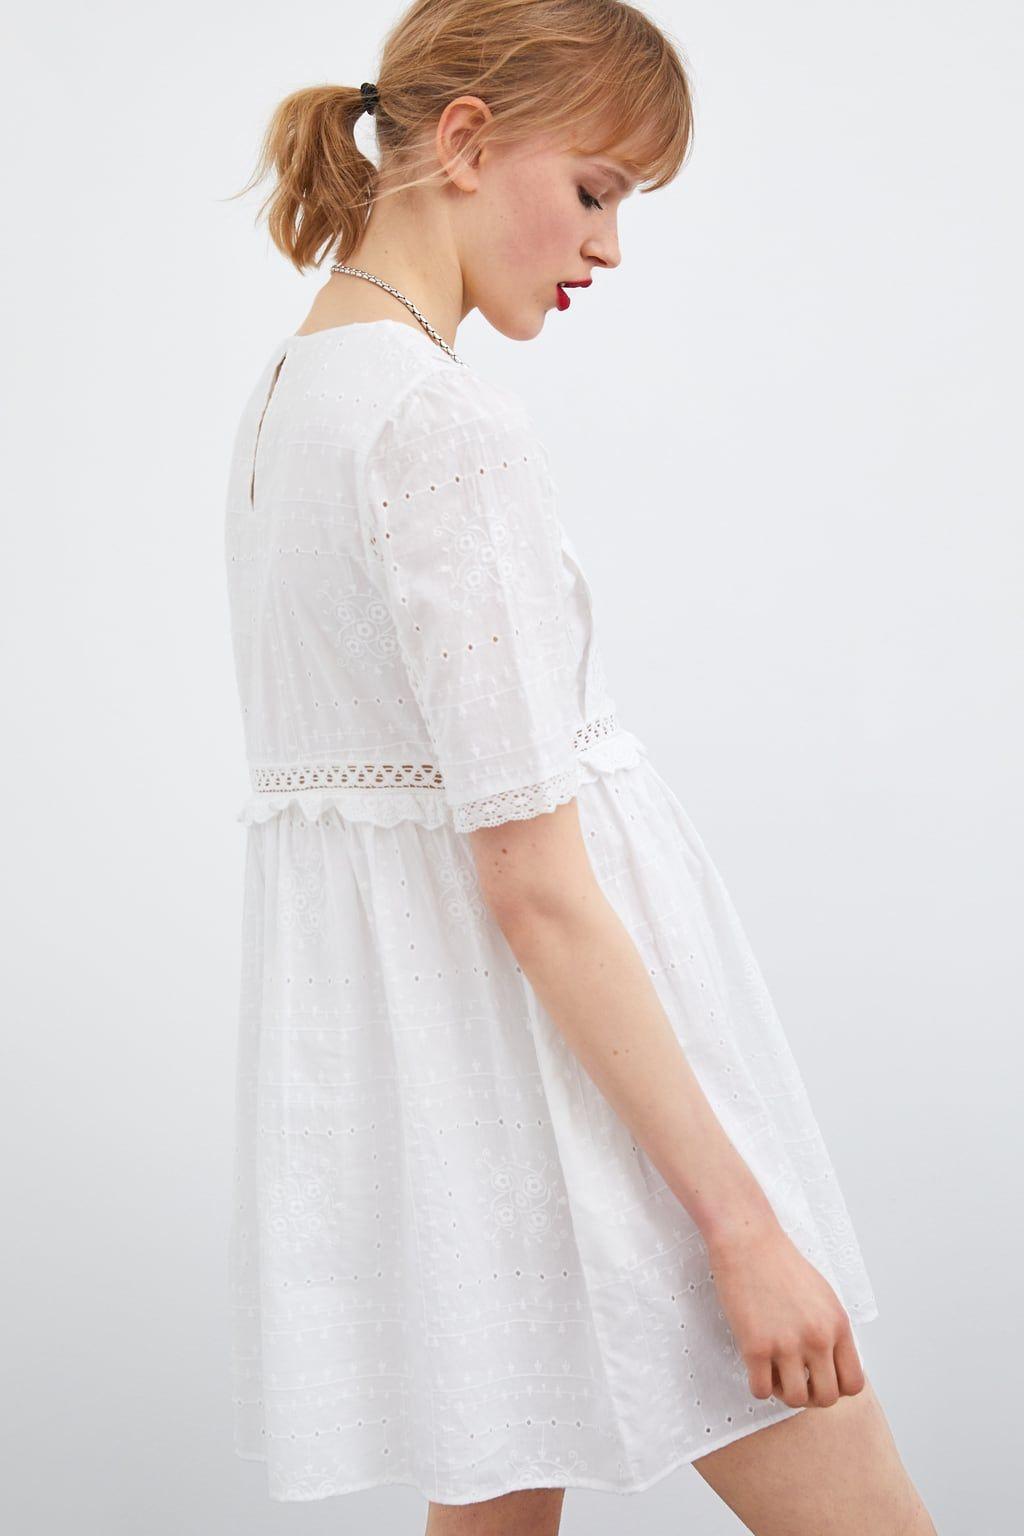 Bordado En 2019Style Vestidos Inspo Vestido Perforado ALcS3Rq54j